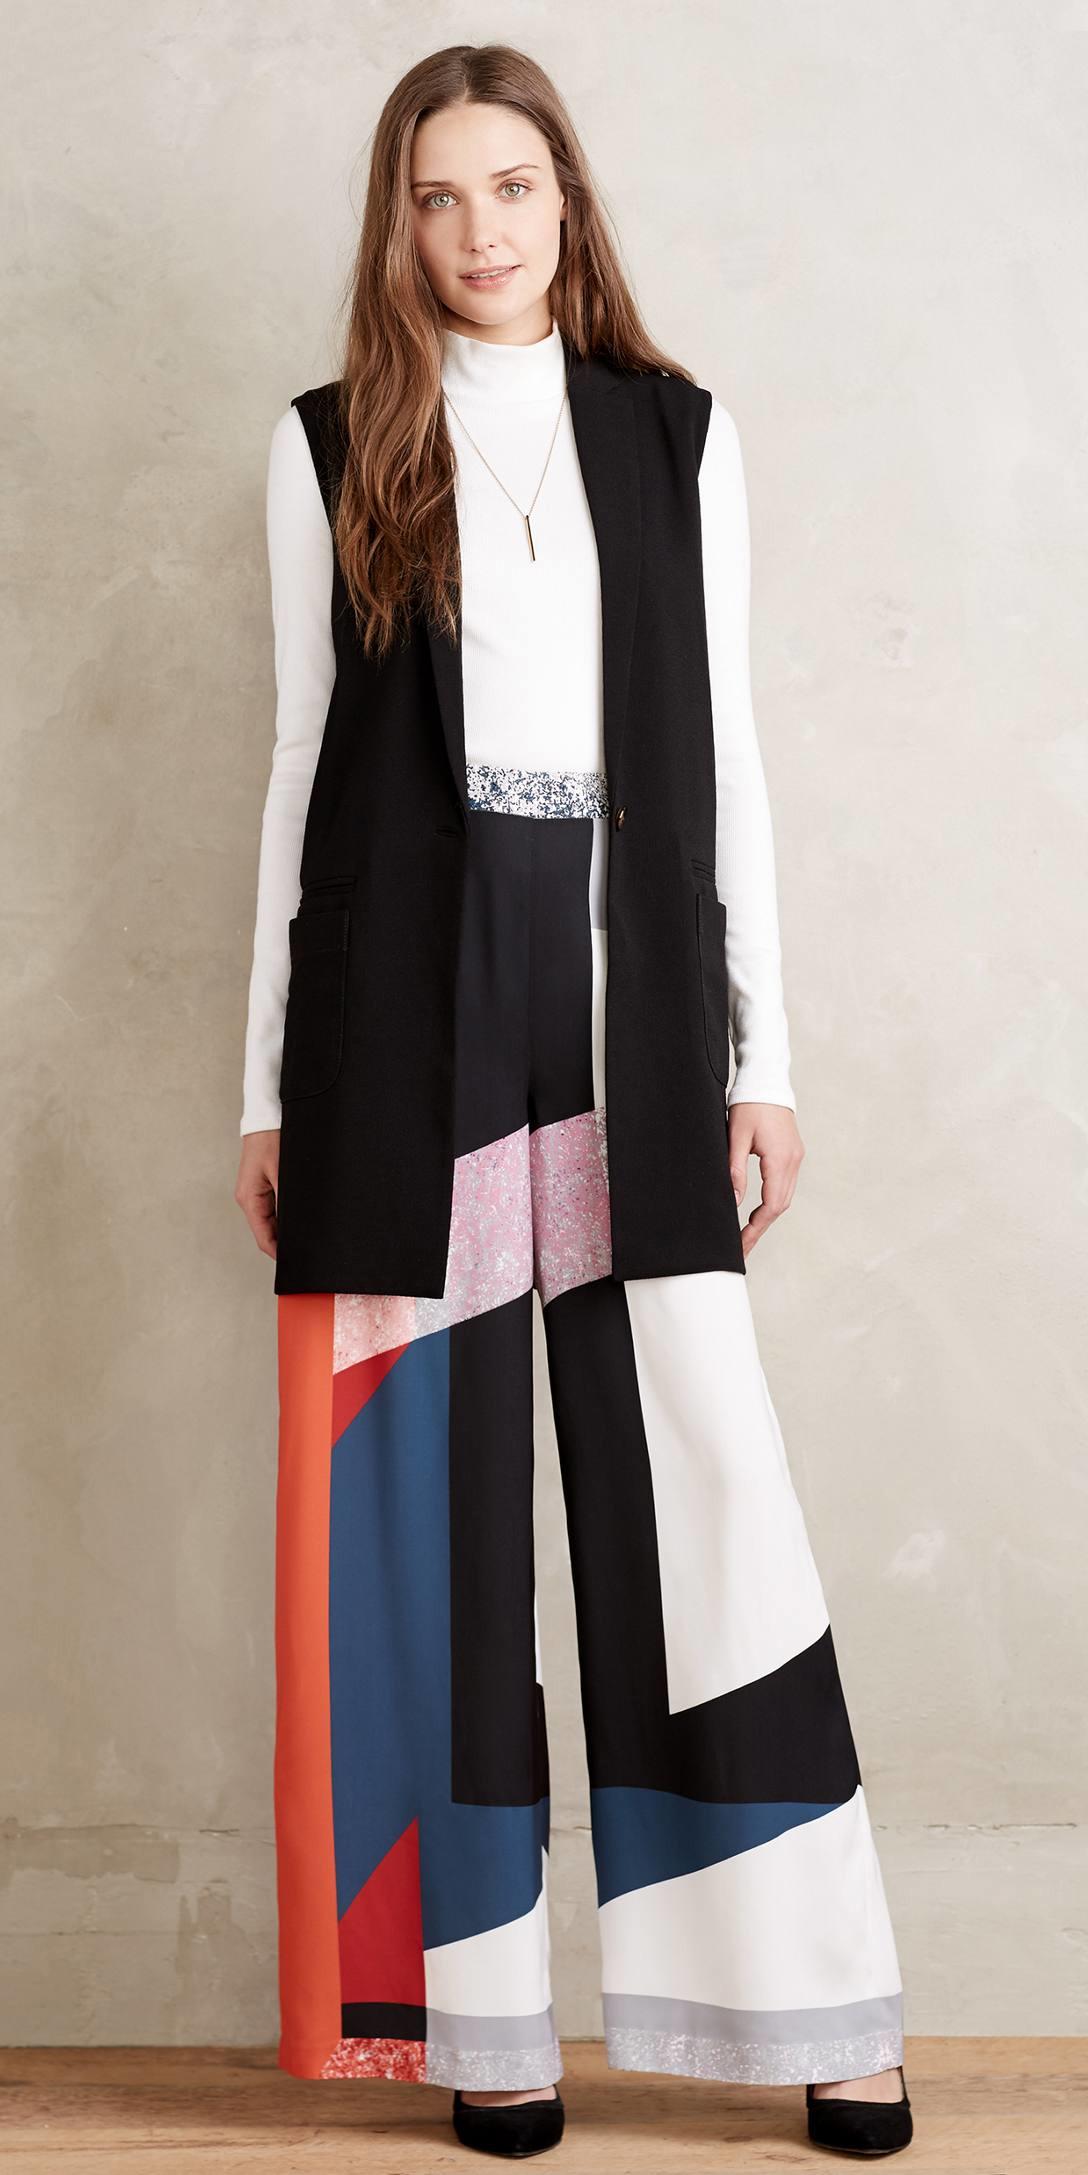 black-wideleg-pants-print-white-tee-turtleneck-black-vest-tailor-black-shoe-pumps-hairr-fall-winter-lunch.jpeg